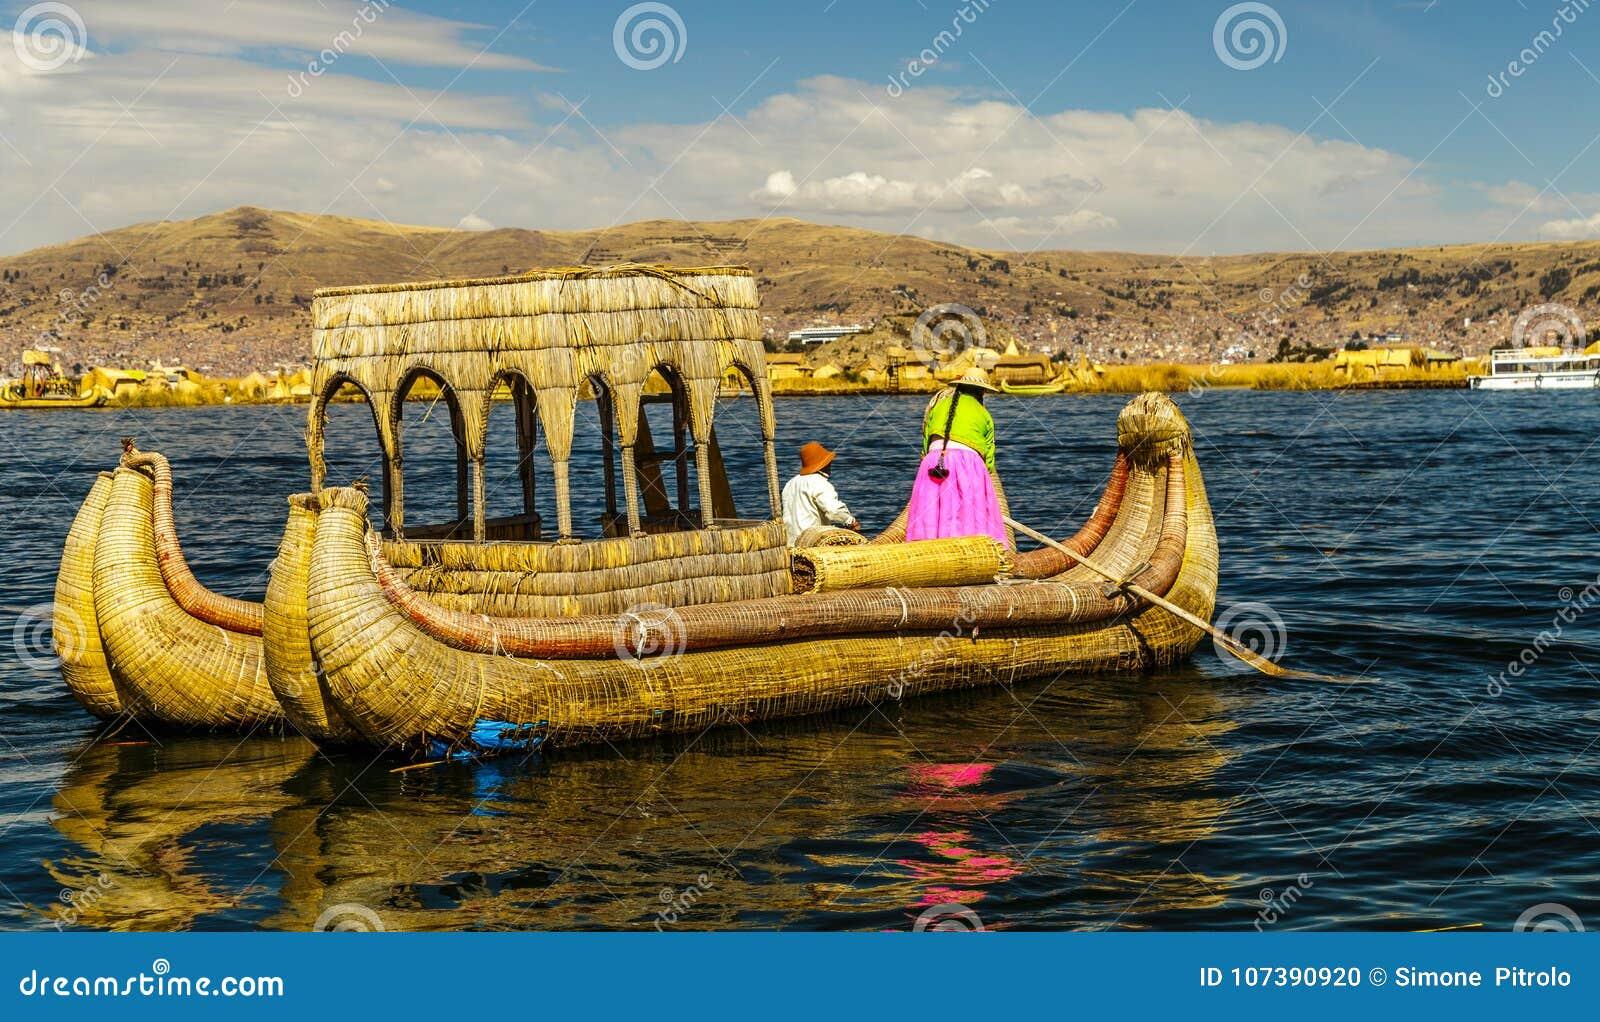 Meer Titicaca, Uros-eiland, bamboeboot